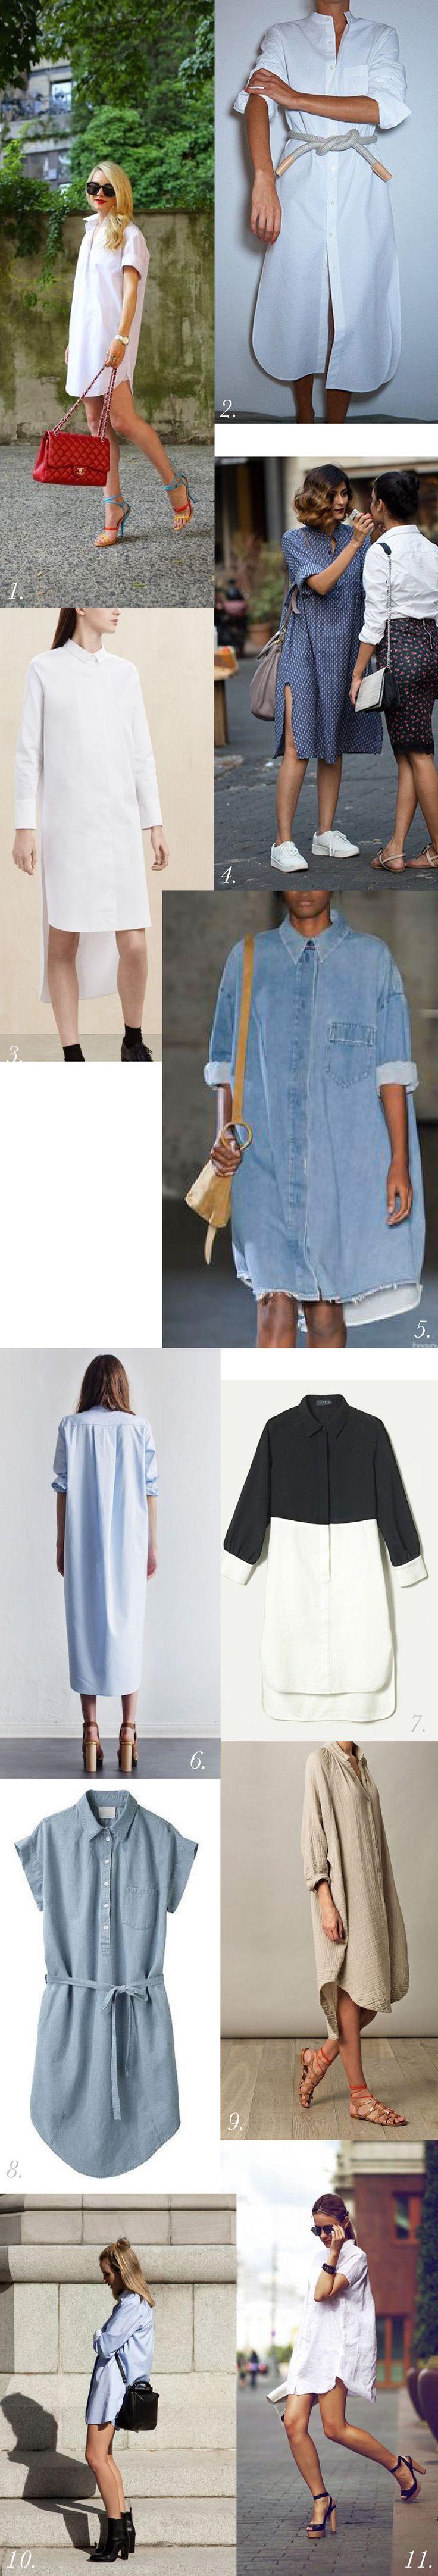 Shirtdress Inspiration & Styling // Kalle Sewalong https://closetcasepatterns.com/shirtdress-inspiration-styling-kalle-sewalong/